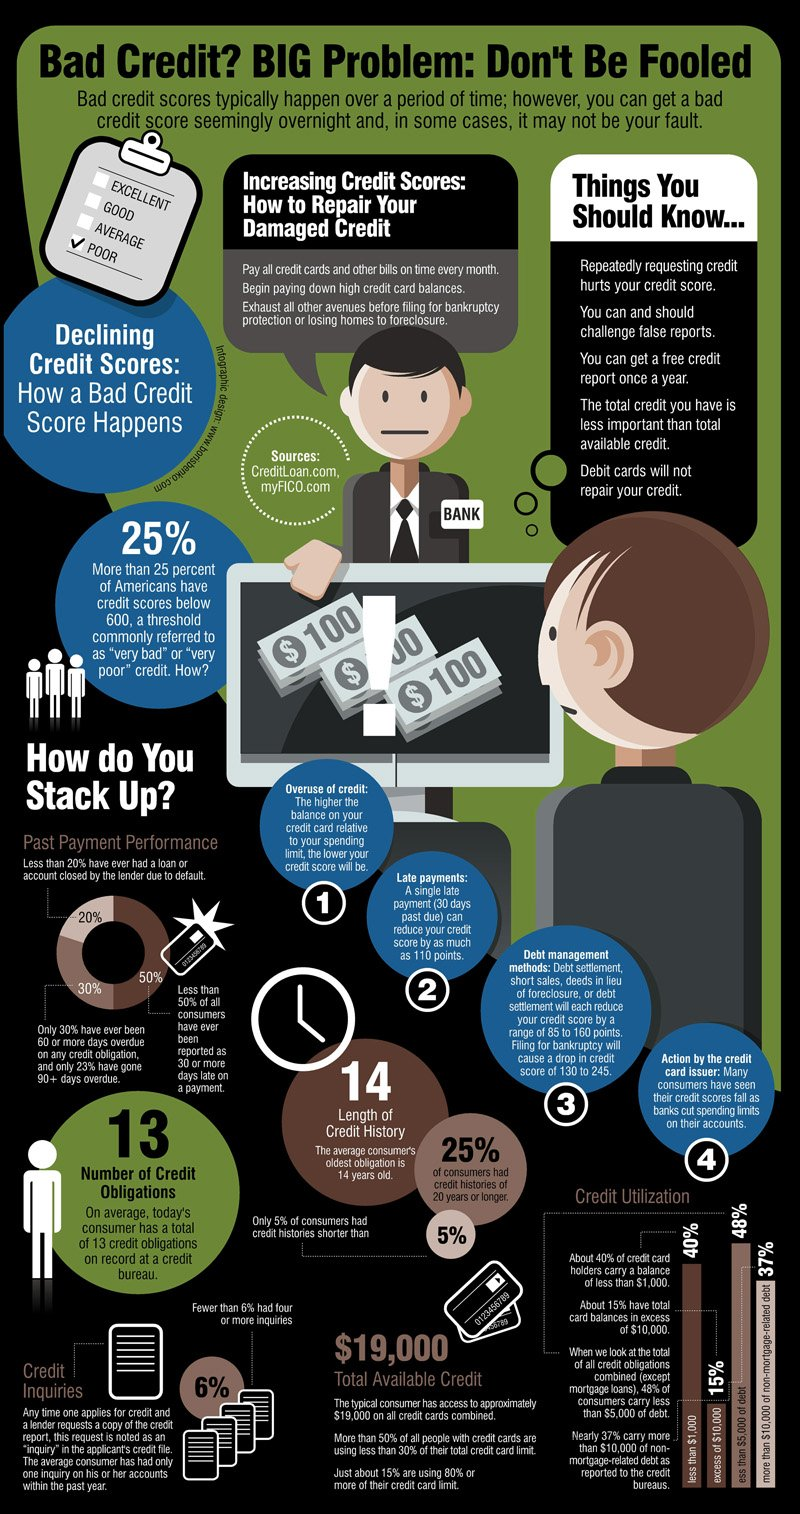 bad-credit-big-problem-infographic-2